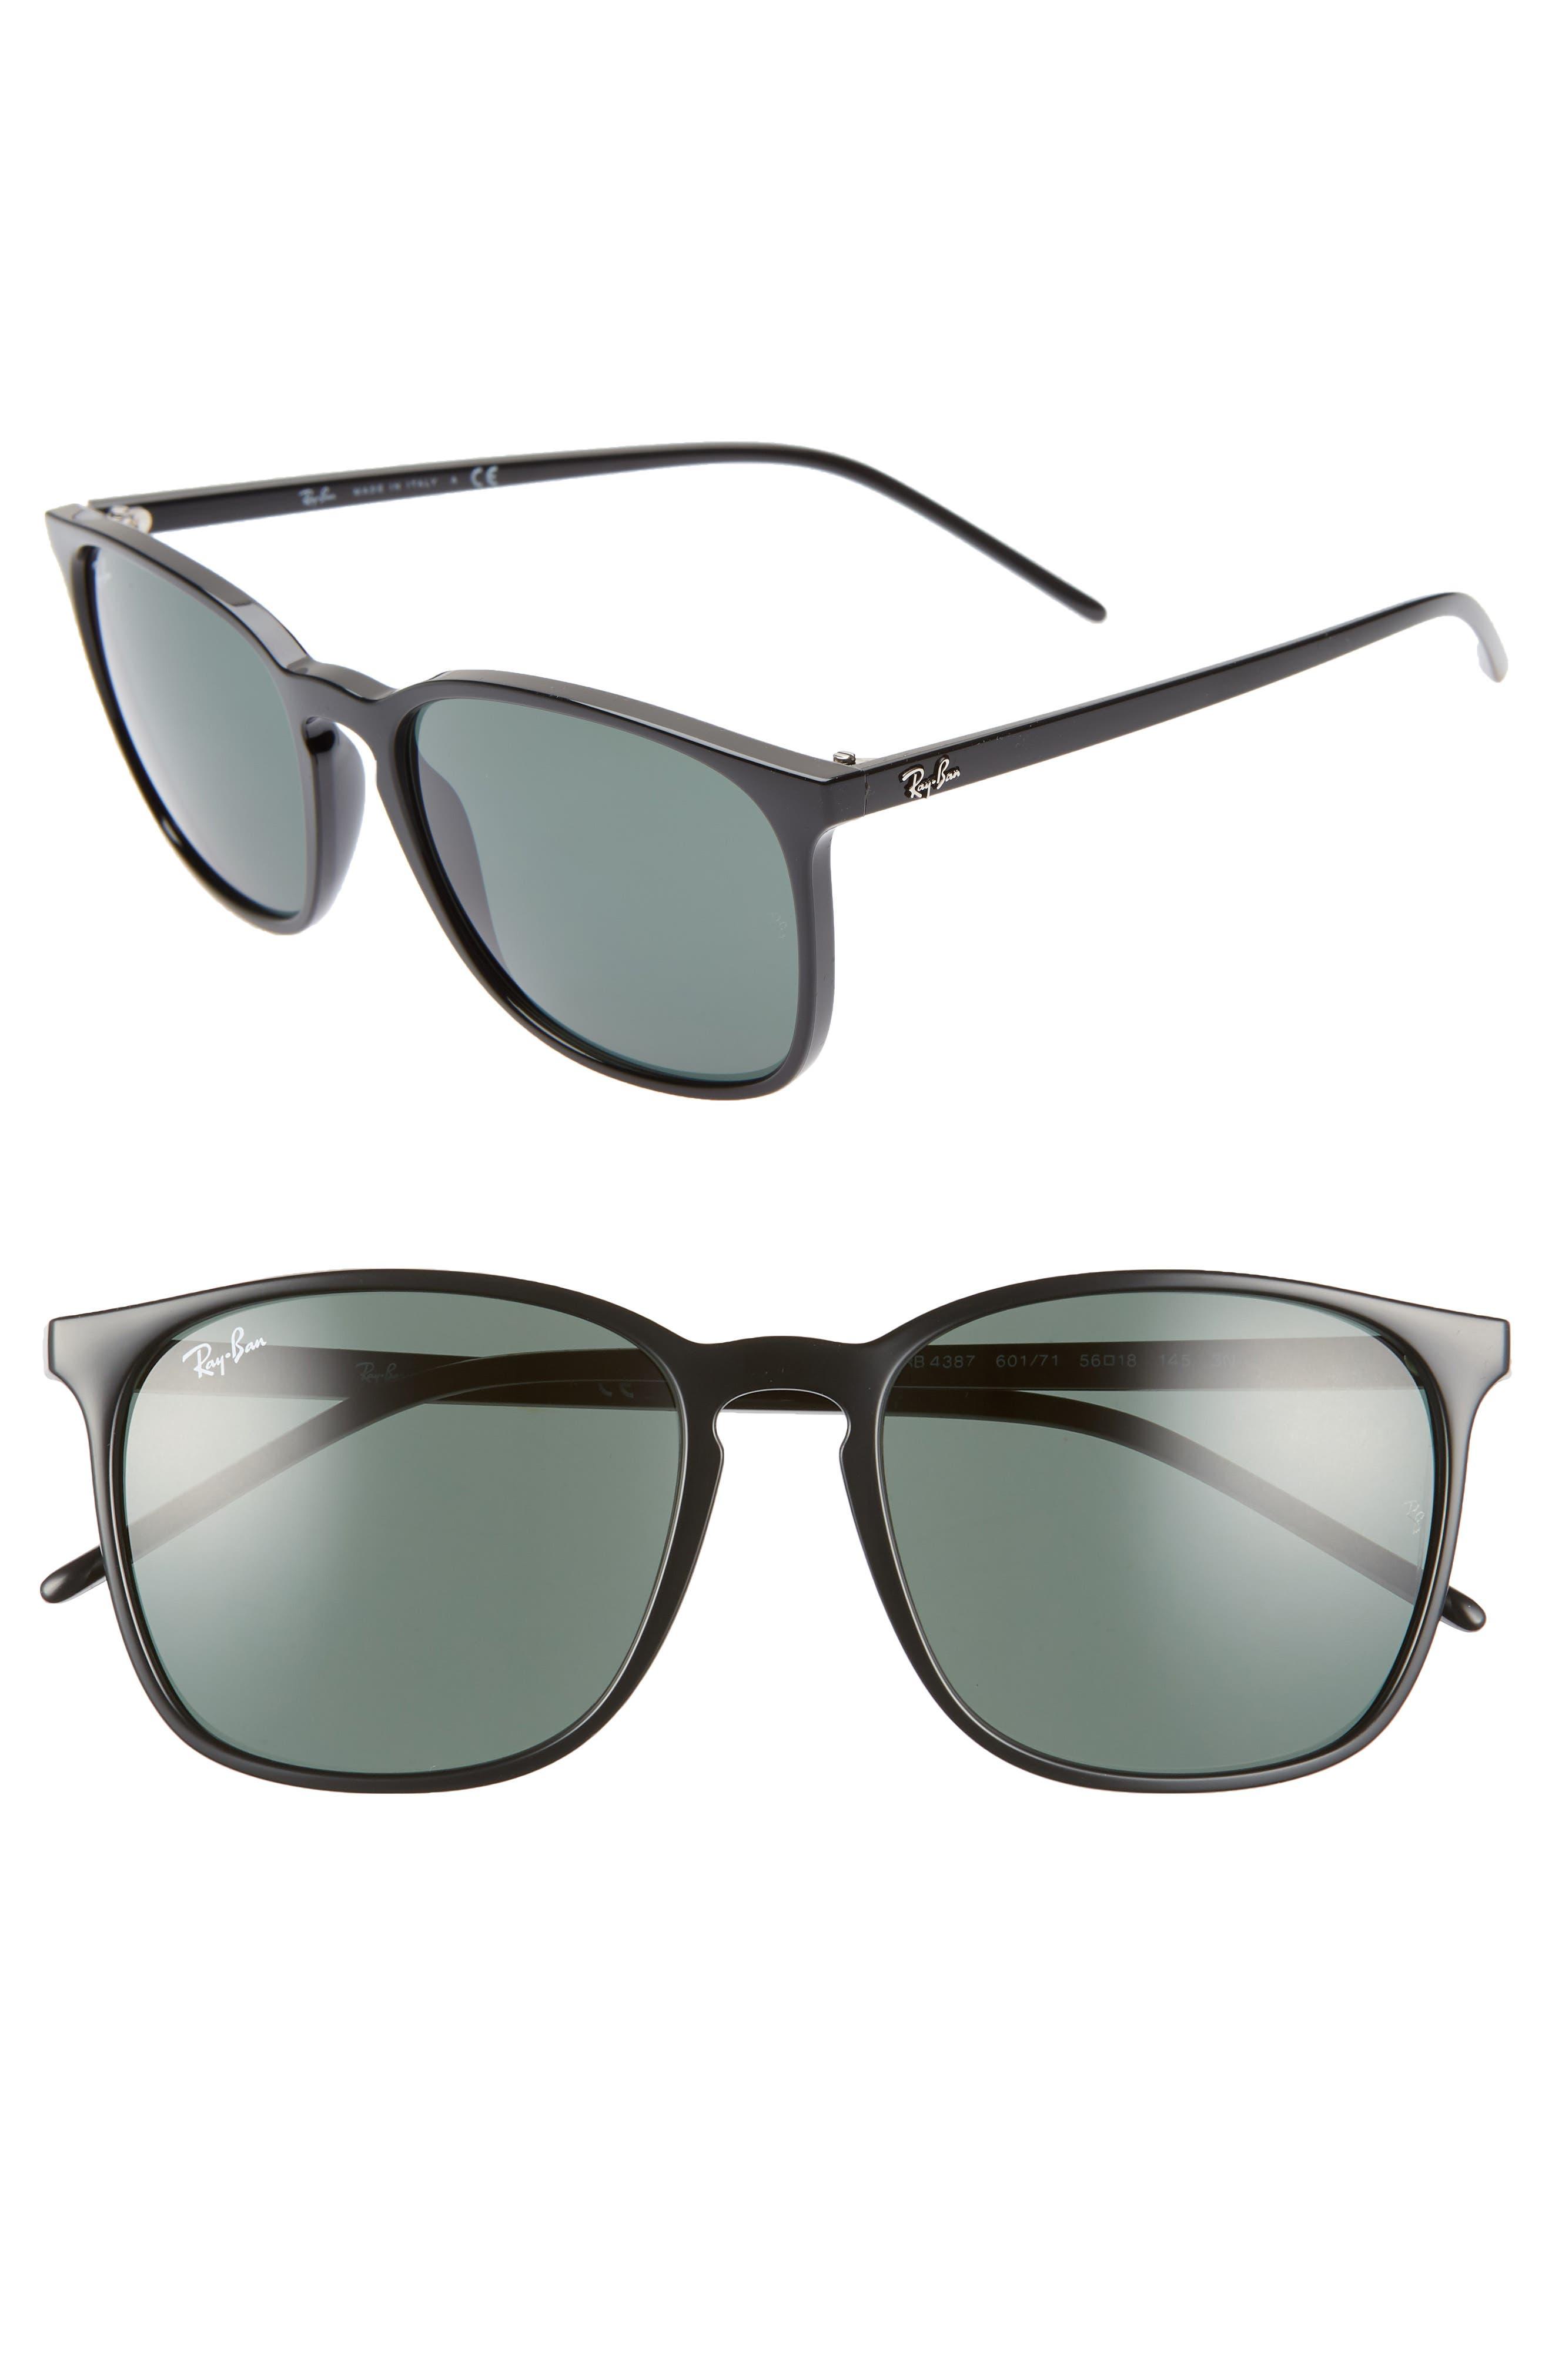 Ray-Ban 5m Sunglasses - Black/ Green Solid